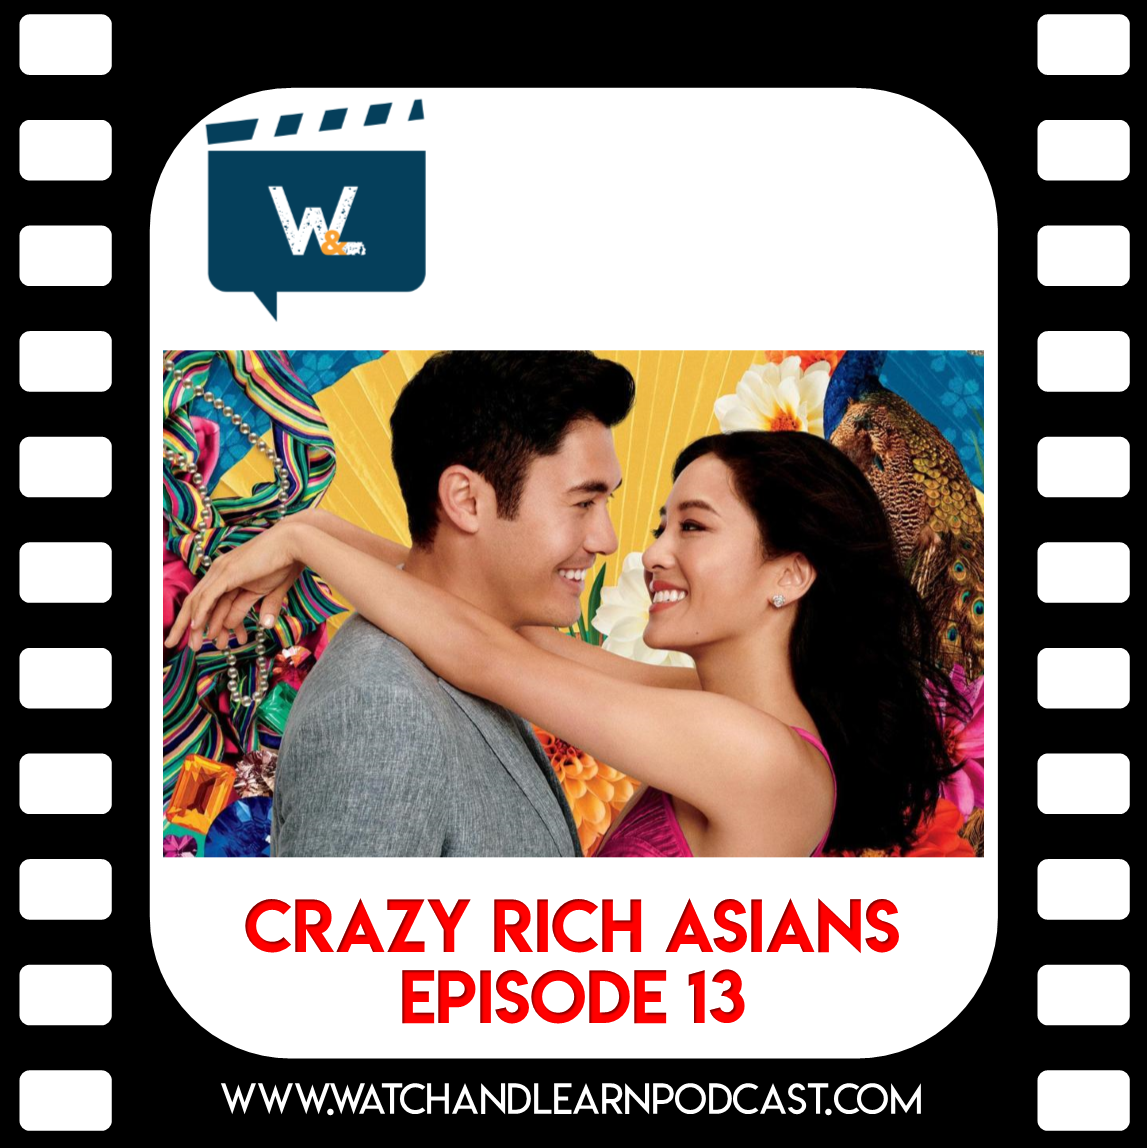 Crazy Rich Asians Podcast